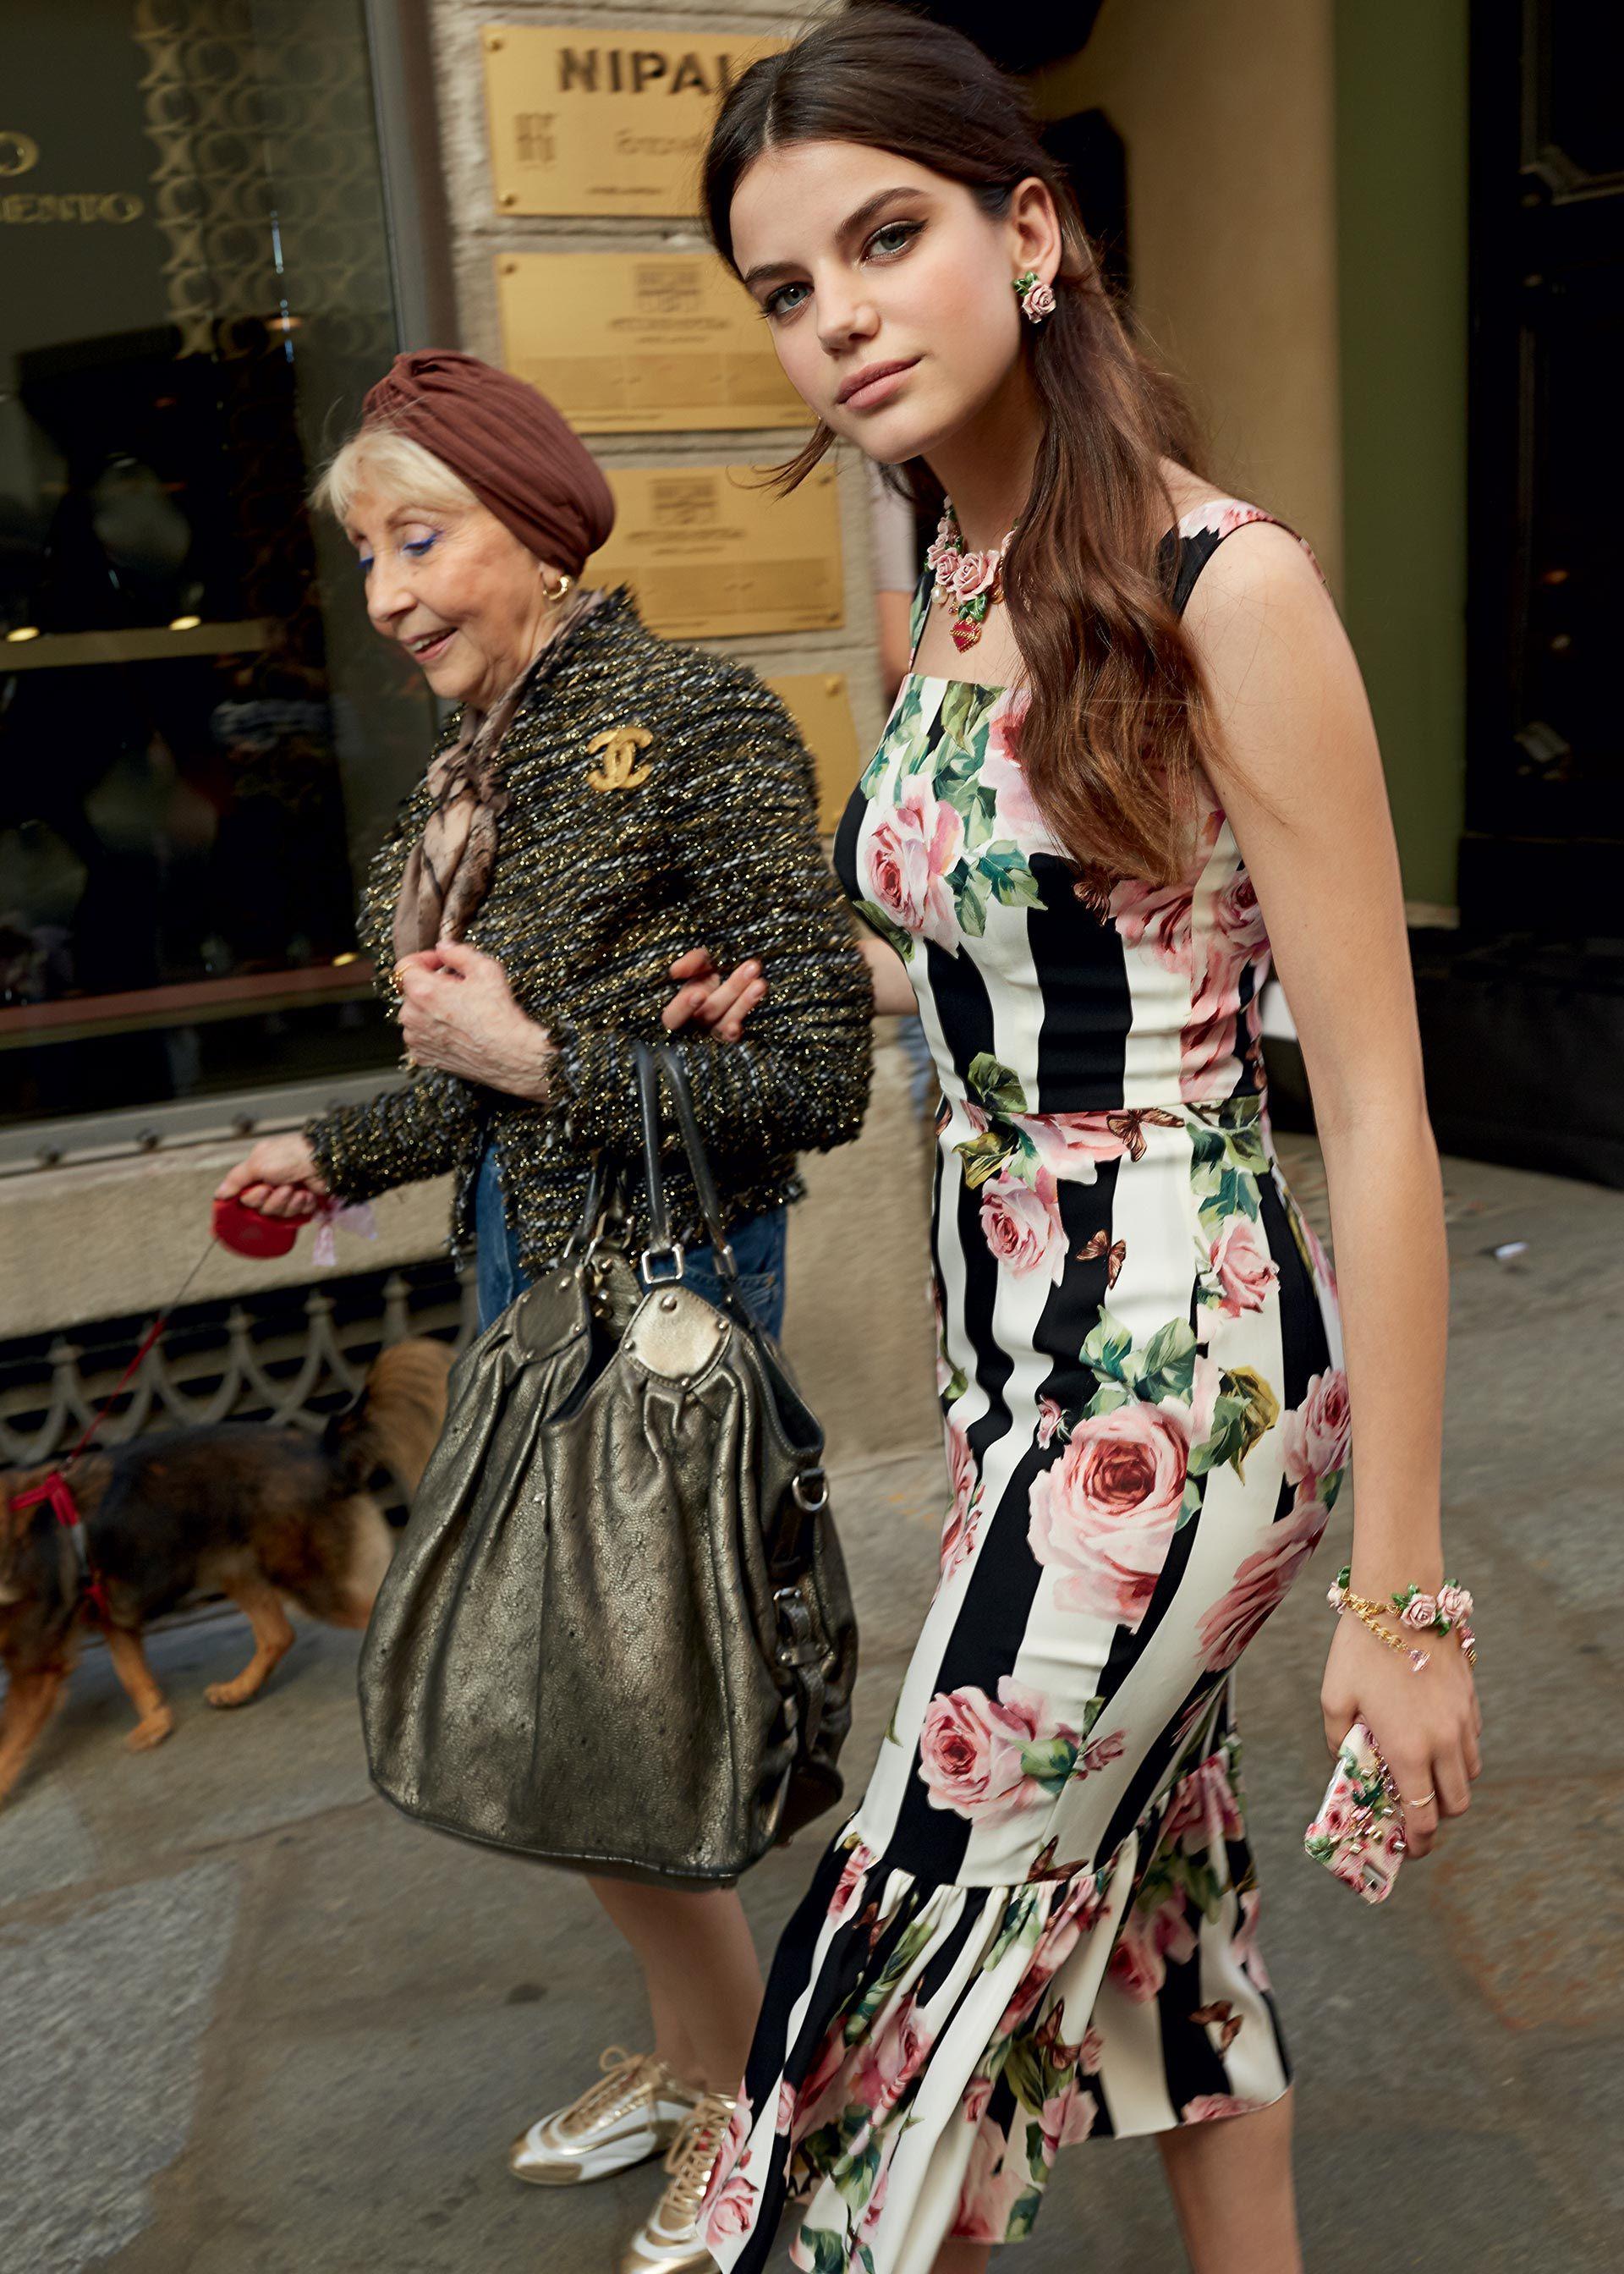 Dolce Gabbana Love Christmas Collection 2020 Discover the new Dolce&Gabbana Women's Love Christmas Collection